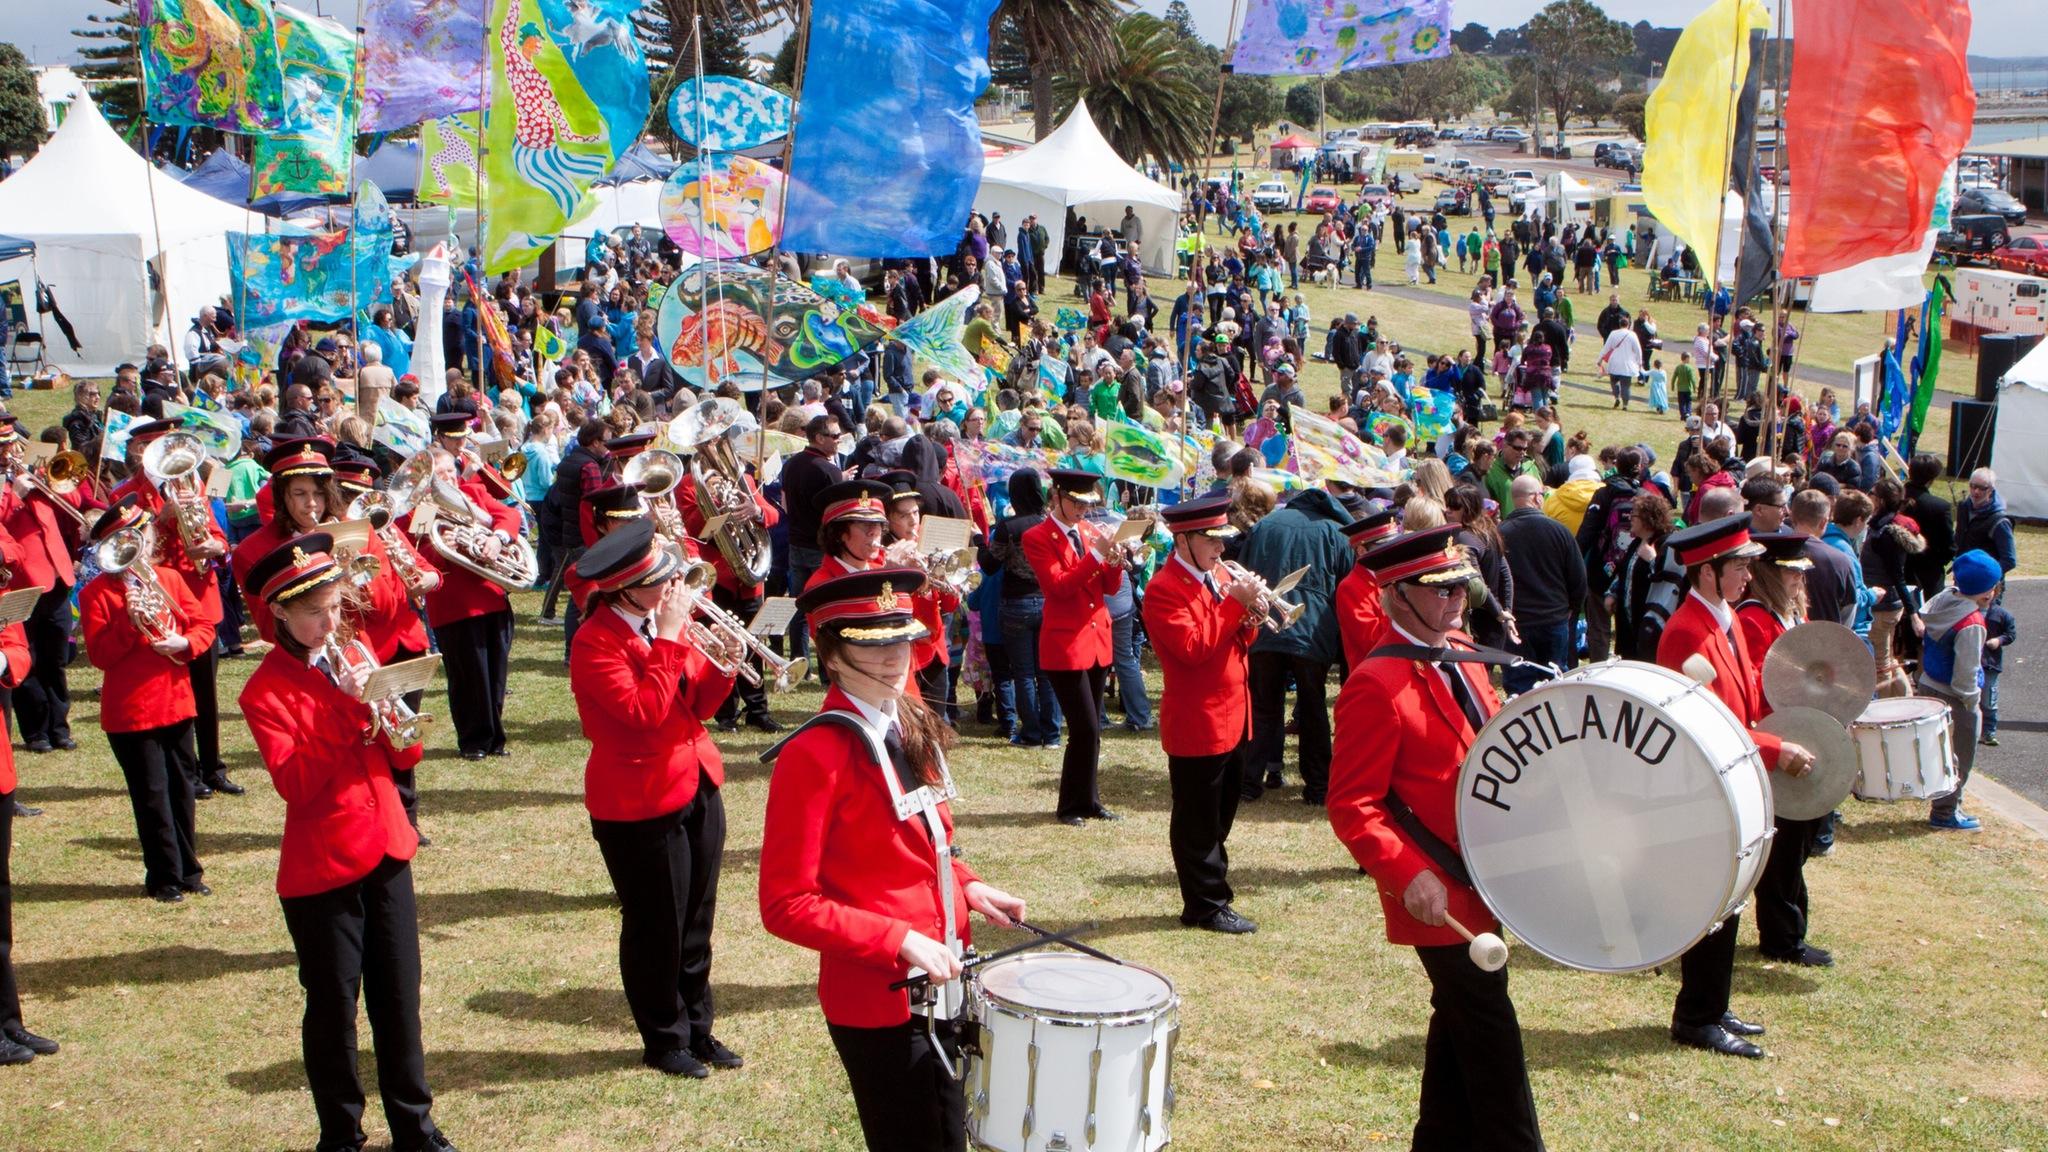 2014 Upwelling Festival